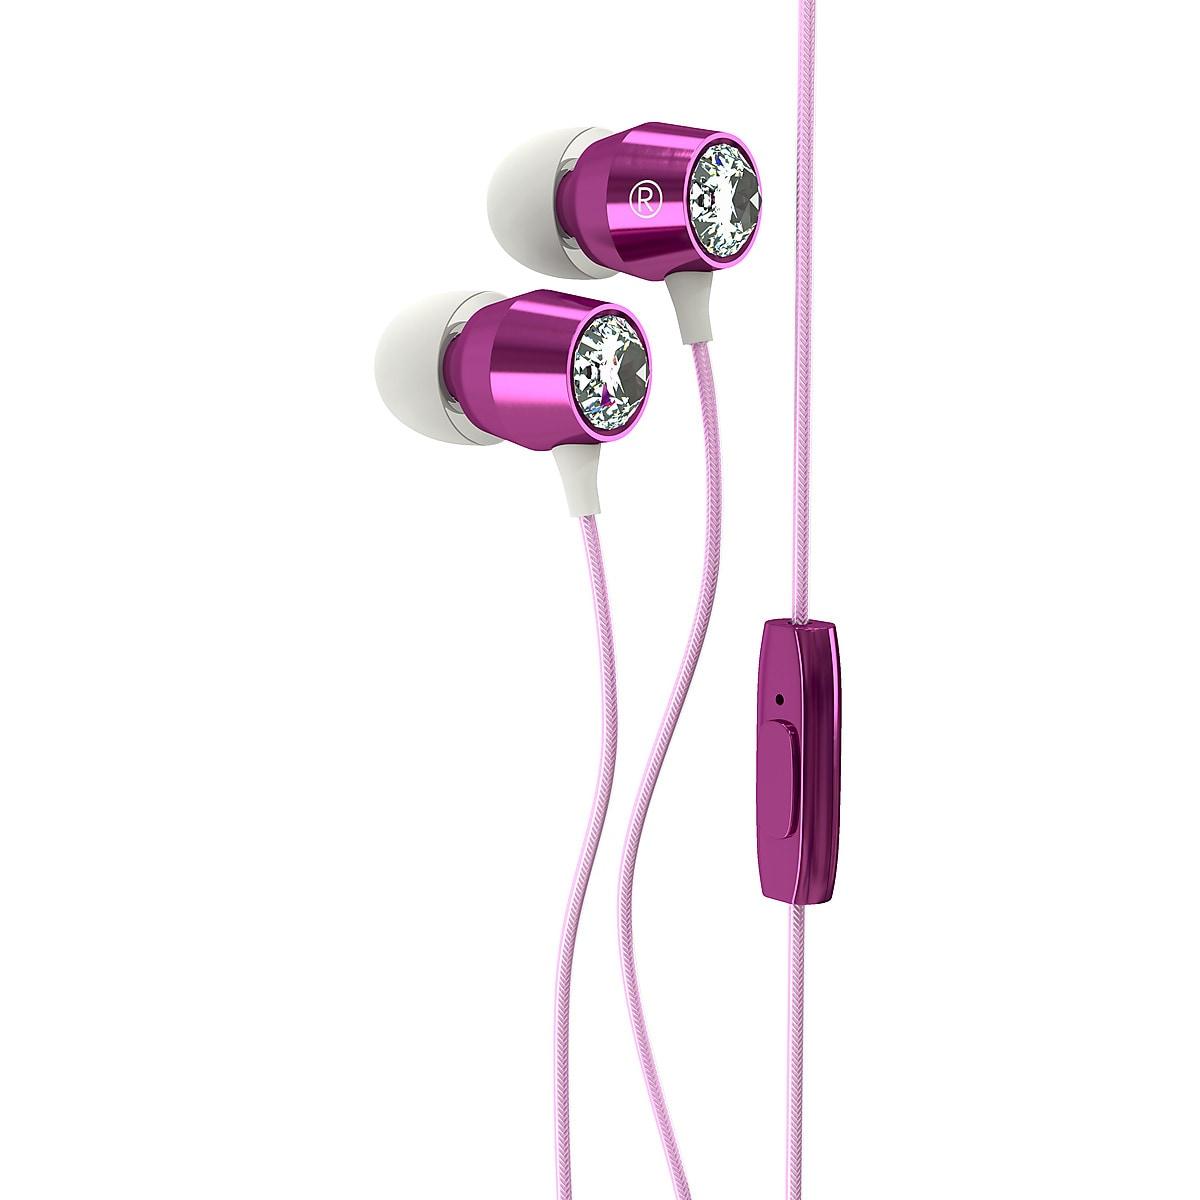 Kopfhörer mit Mikrofon Exibel IHX50